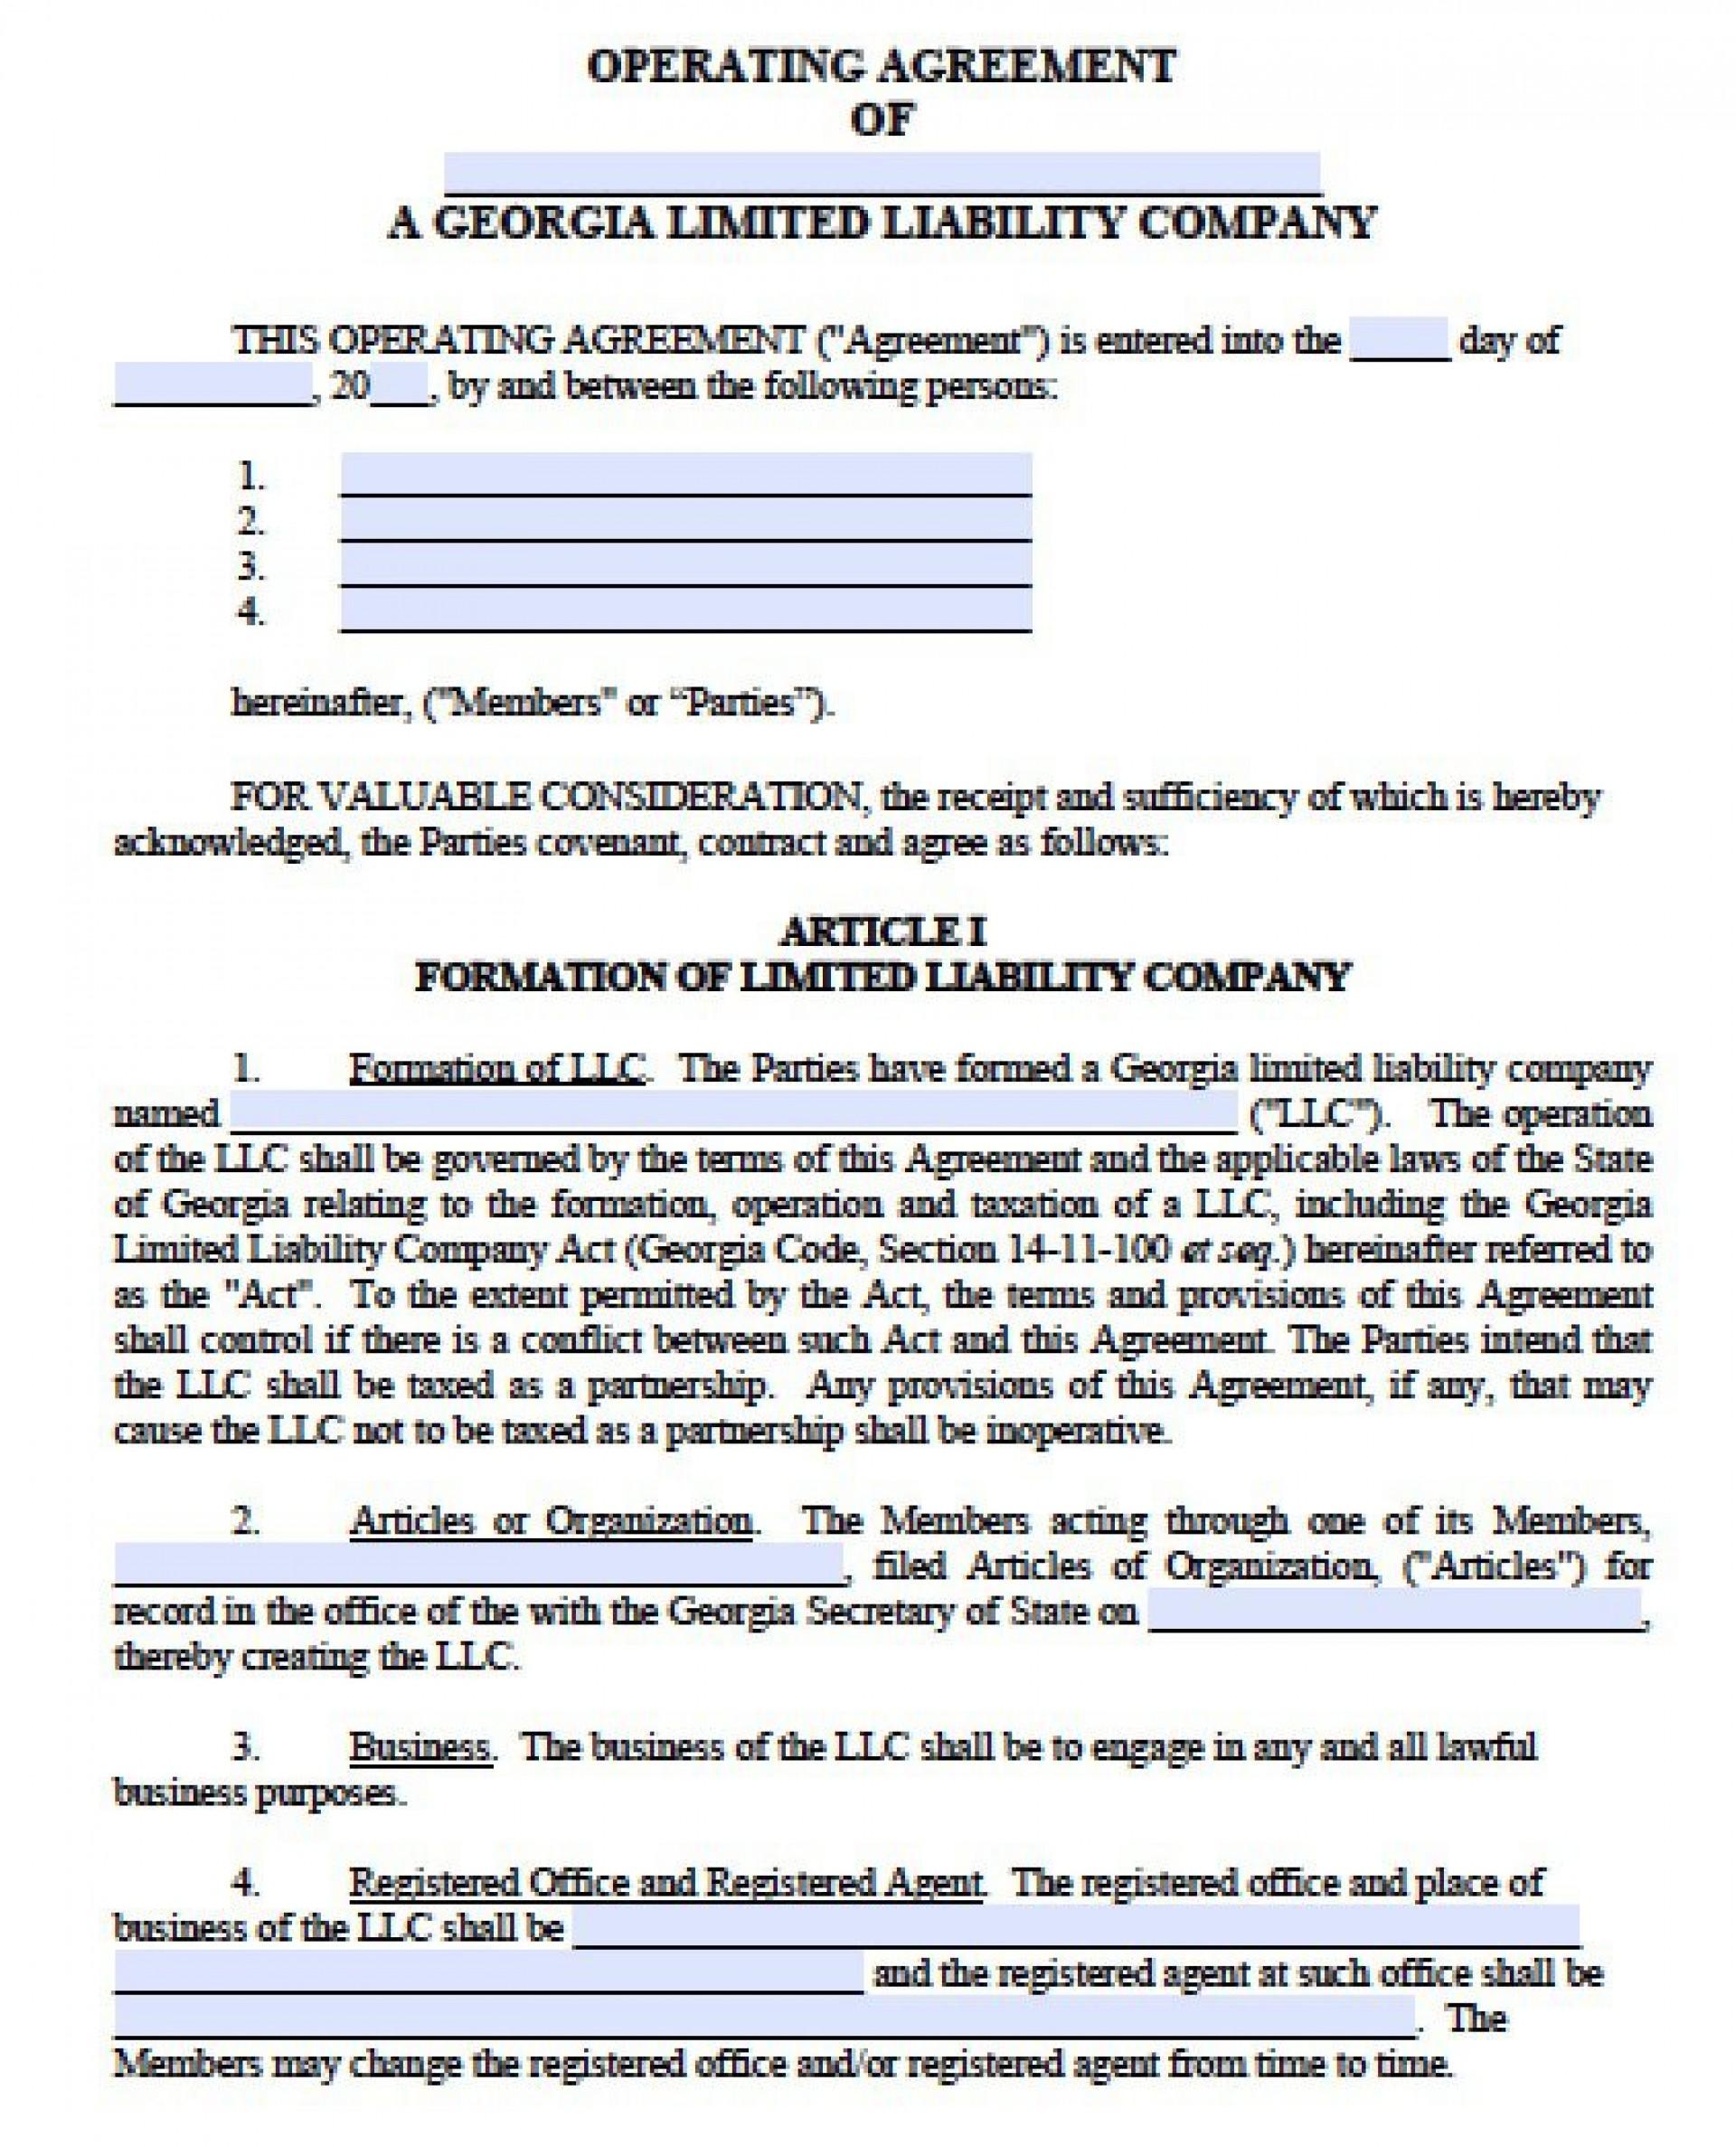 003 Impressive Operating Agreement Template For Llc Inspiration  Form Florida Texa1920